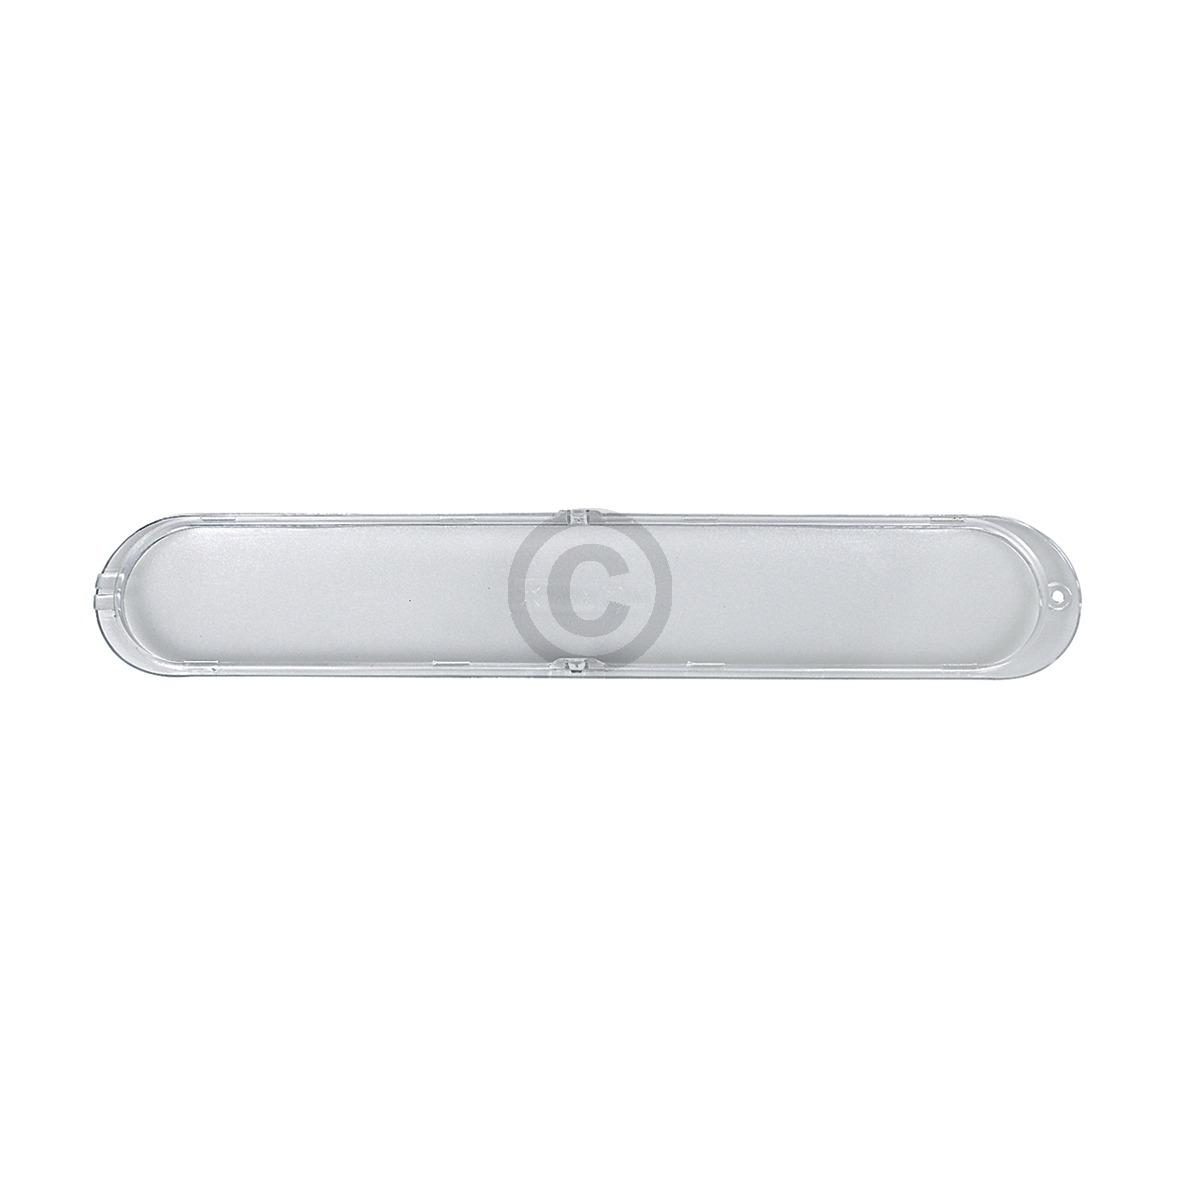 Lampenabdeckung f/ür Dunstabzugshaube 370x65 mm Whirlpool 482000008881